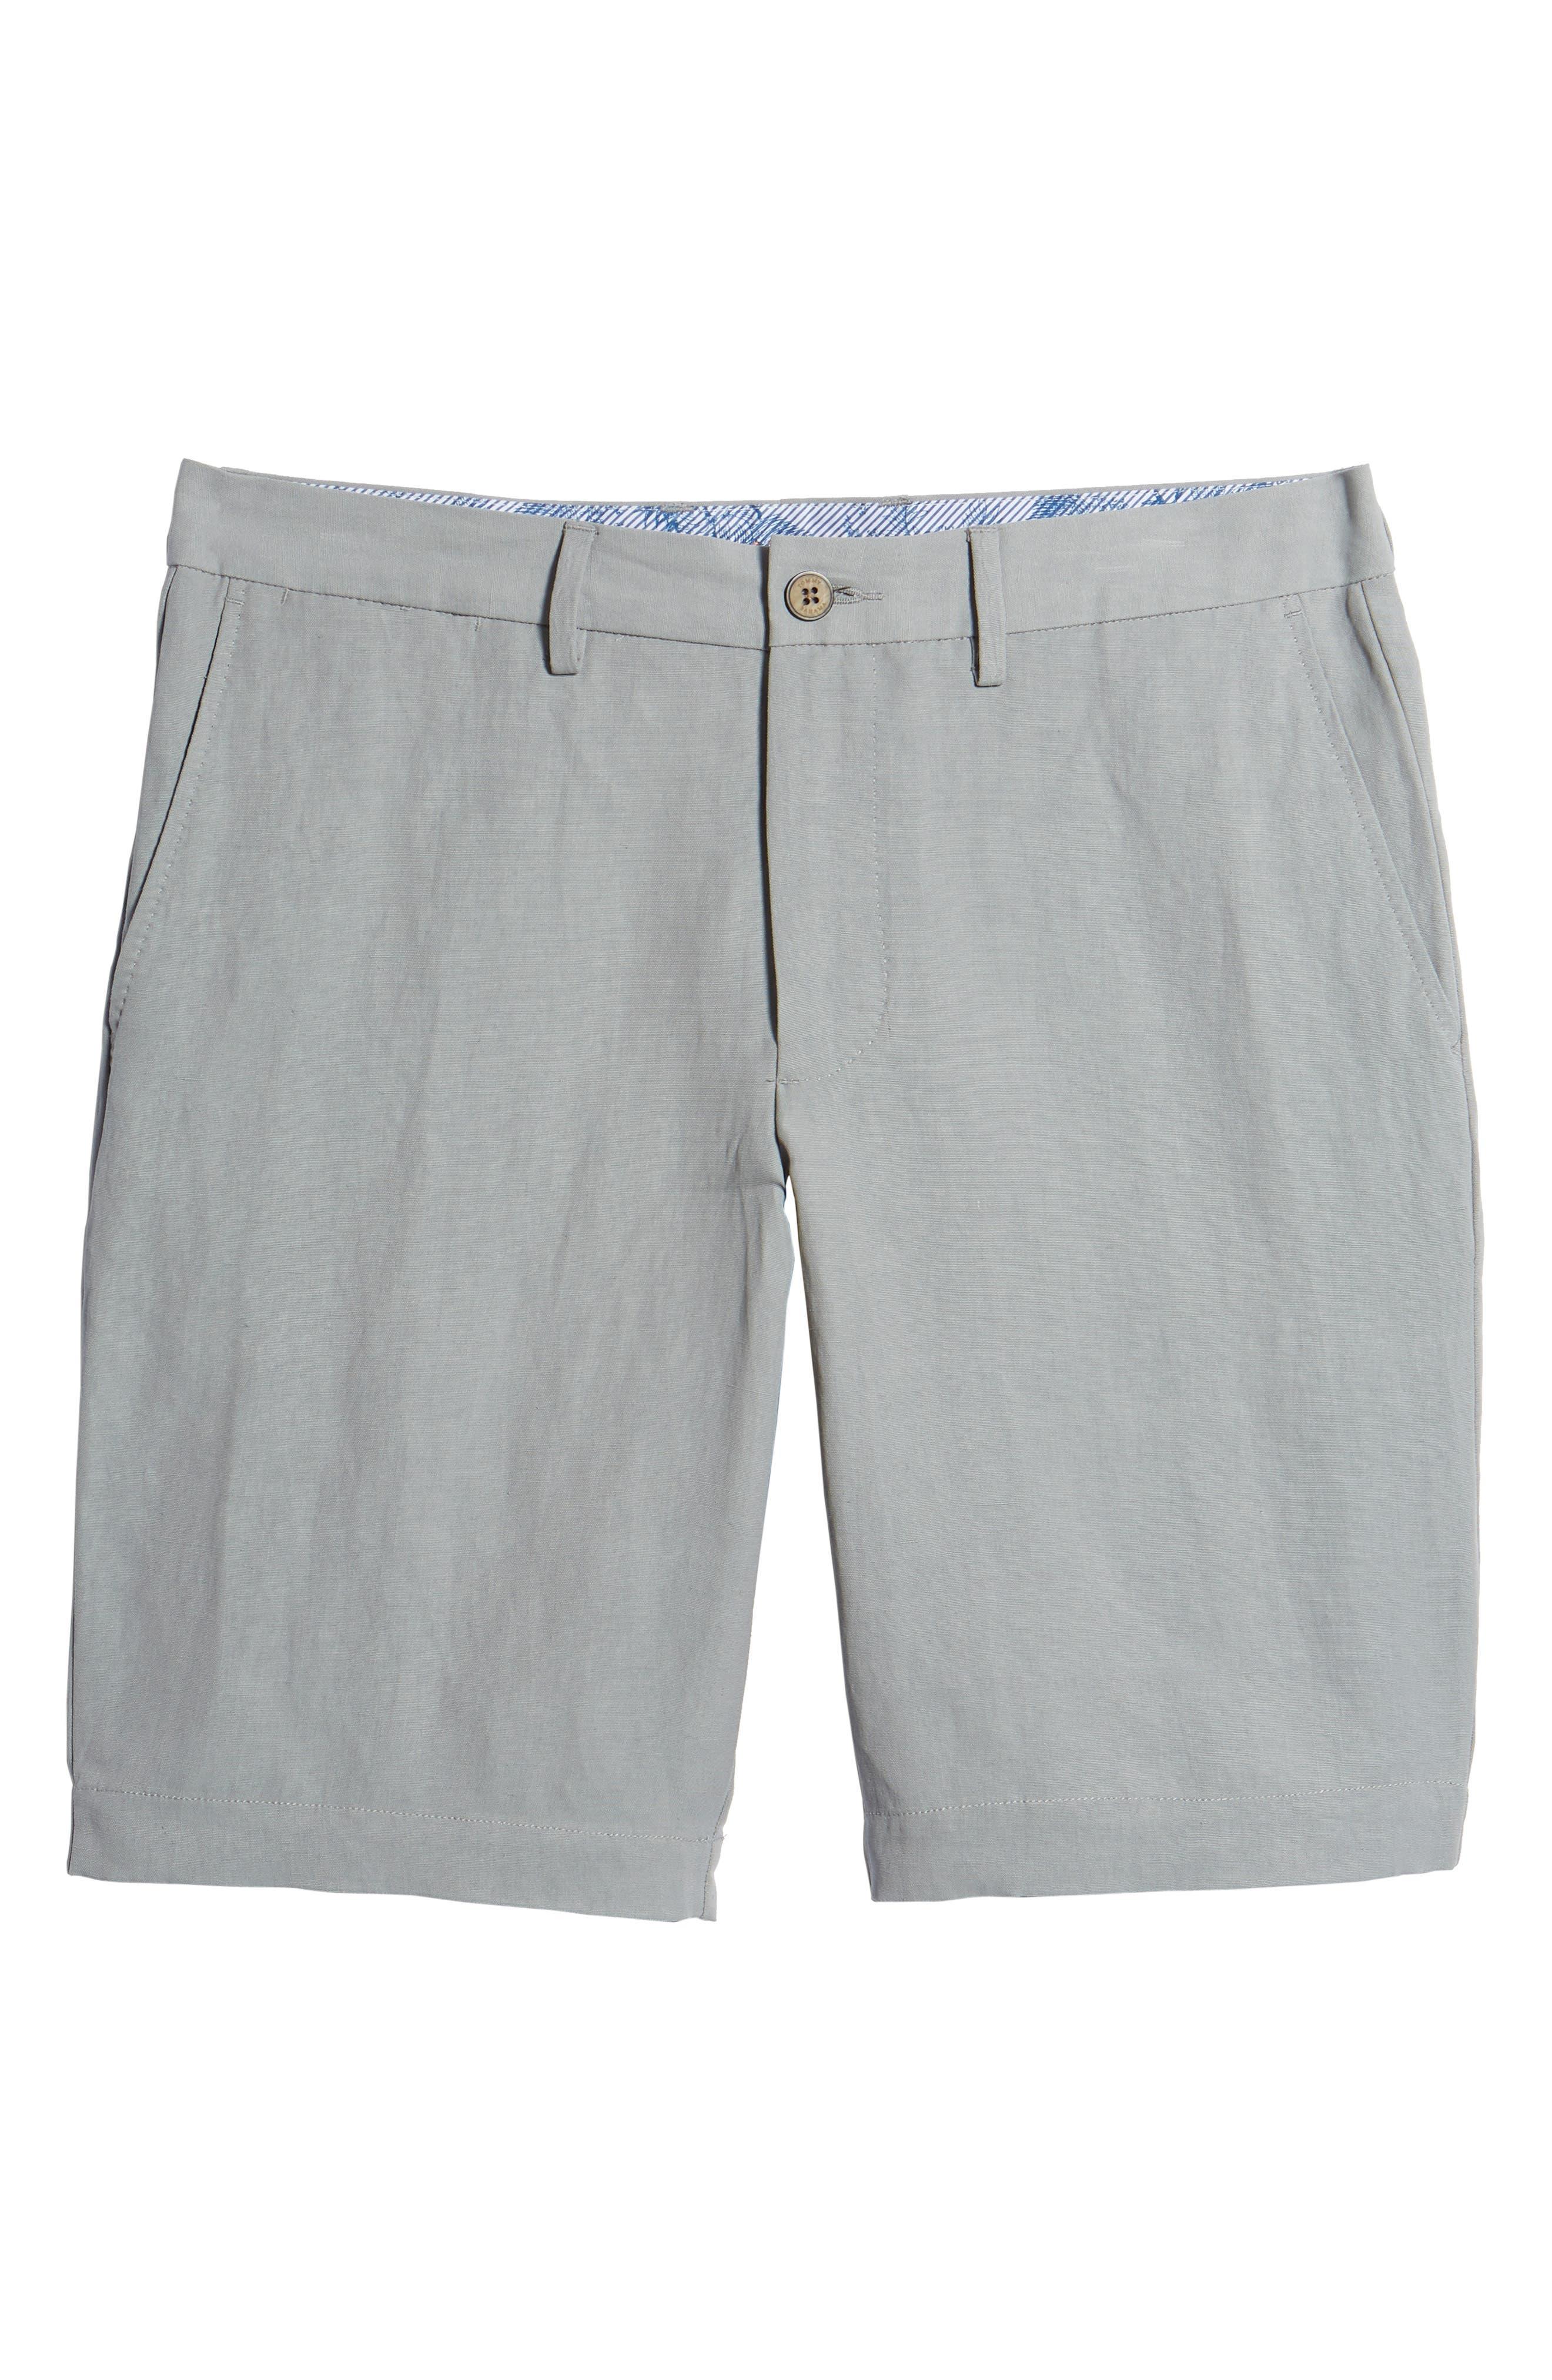 Monterey Flat Front Silk & Linen Shorts,                             Alternate thumbnail 6, color,                             LIGHT GREY